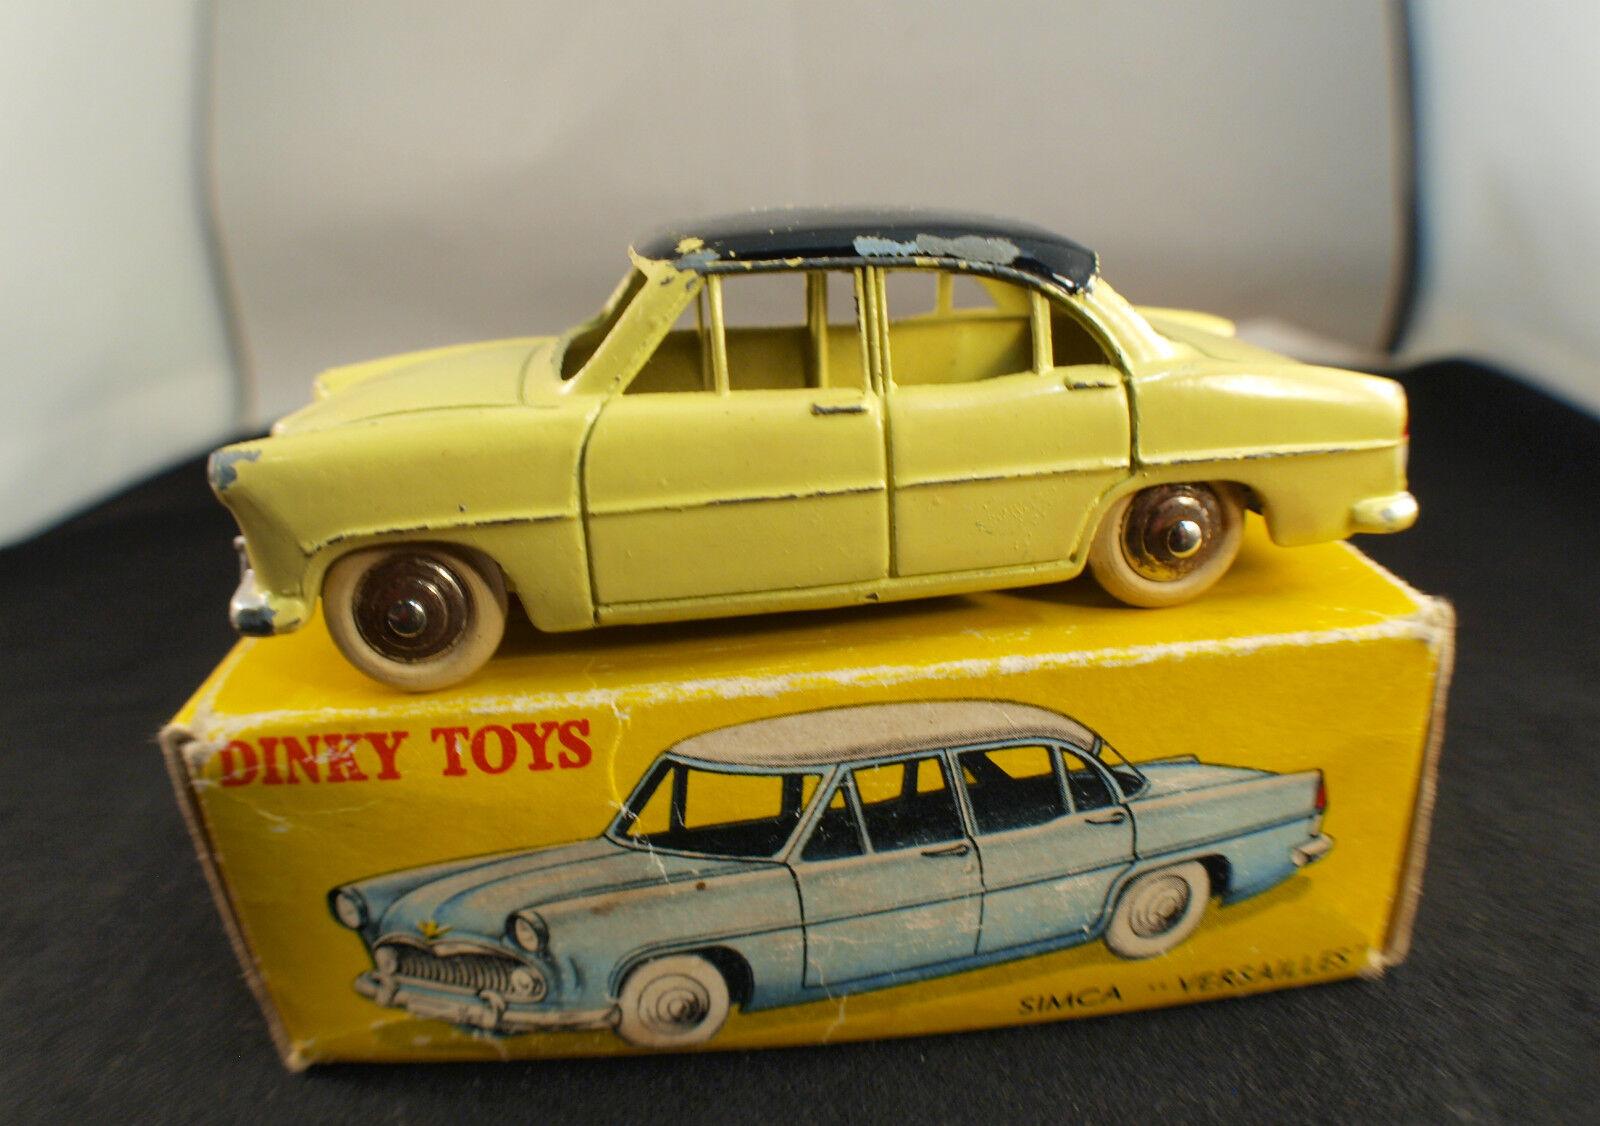 Dinky Toys F 24 Z Simca Versailles box